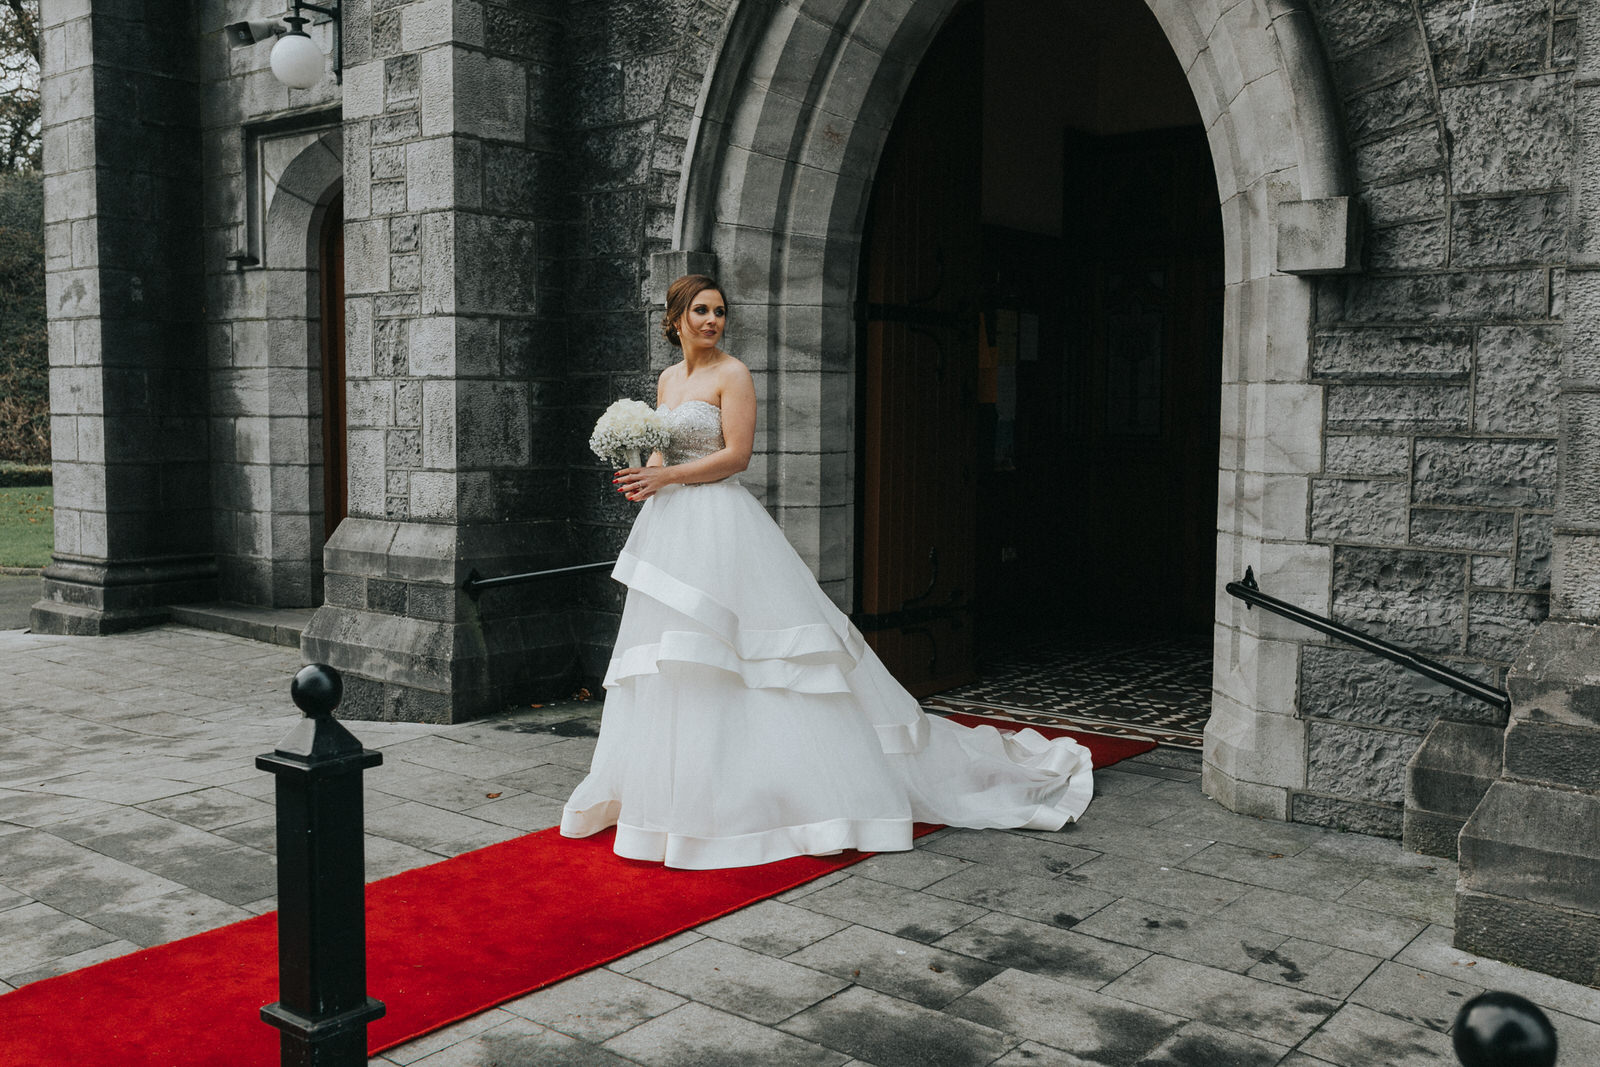 Clonabreany_wedding-photographer_roger_kenny_ireland_061.jpg